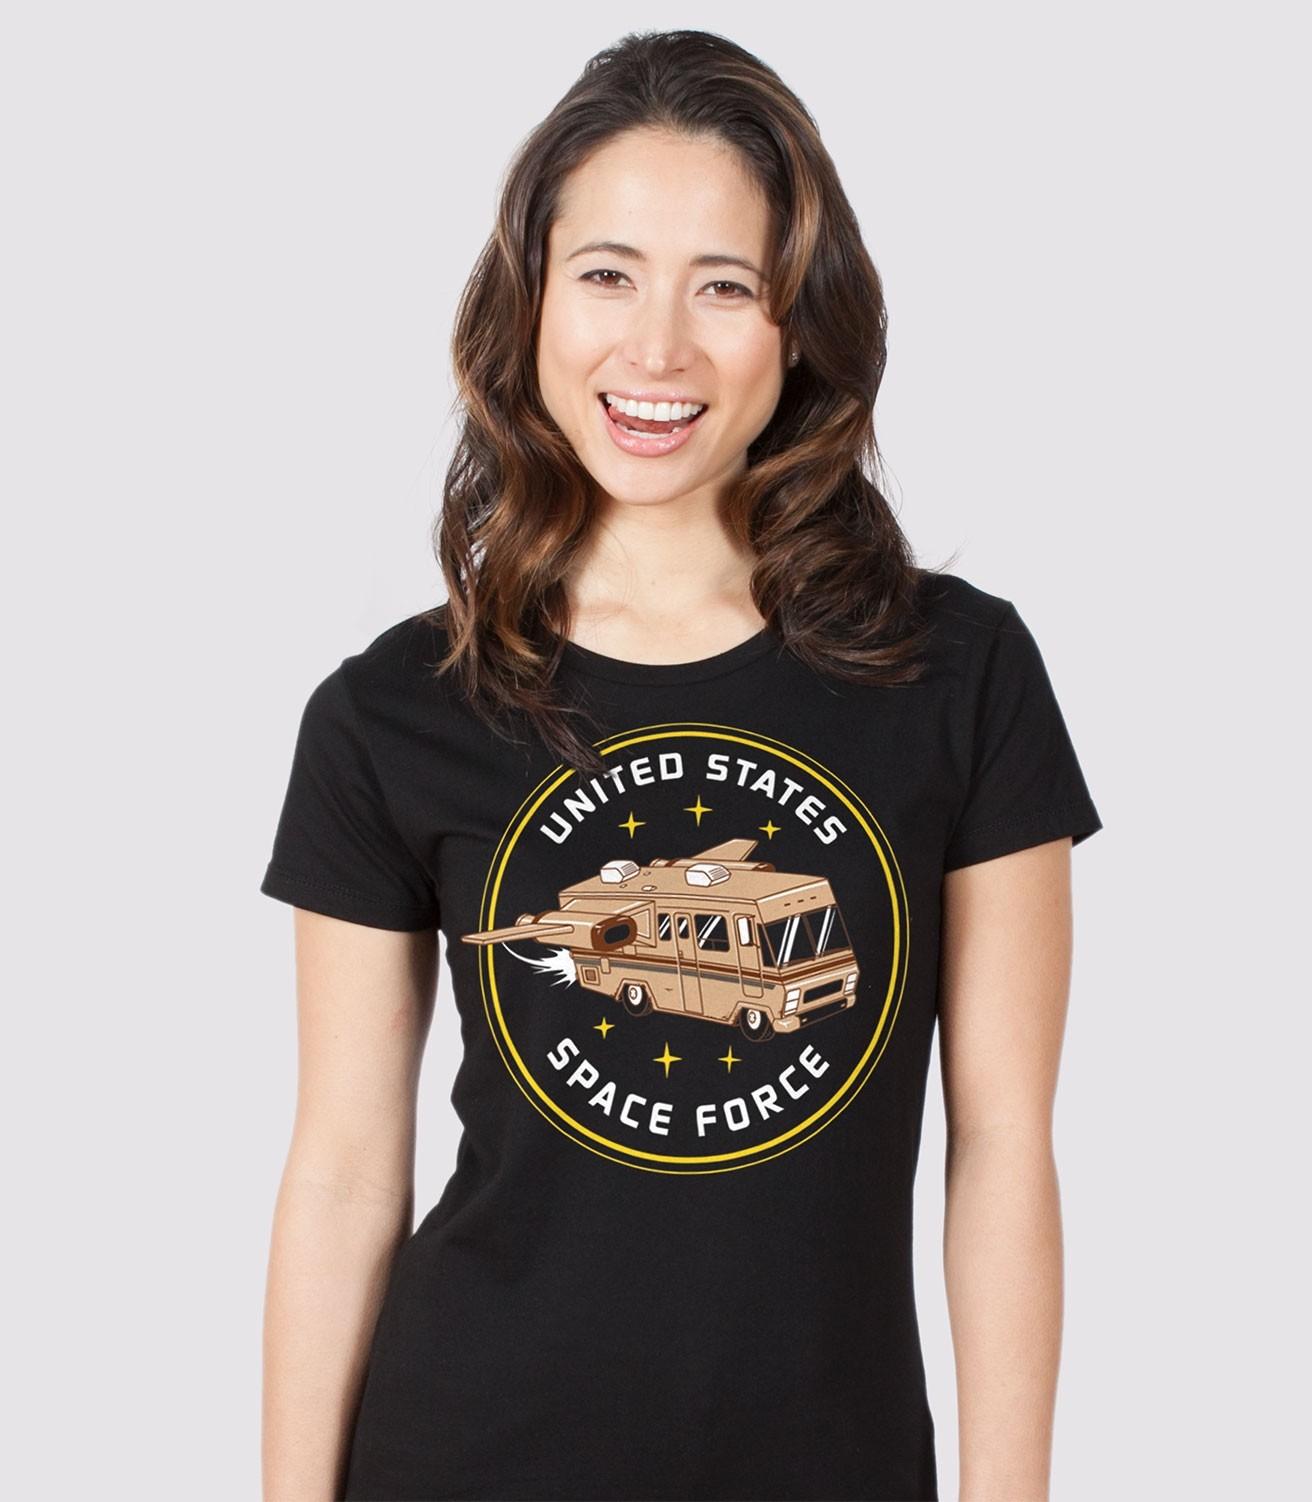 b2c2b0fcdb Space Force Funny Women's Cotton/Poly T-Shirt | Headline Shirts